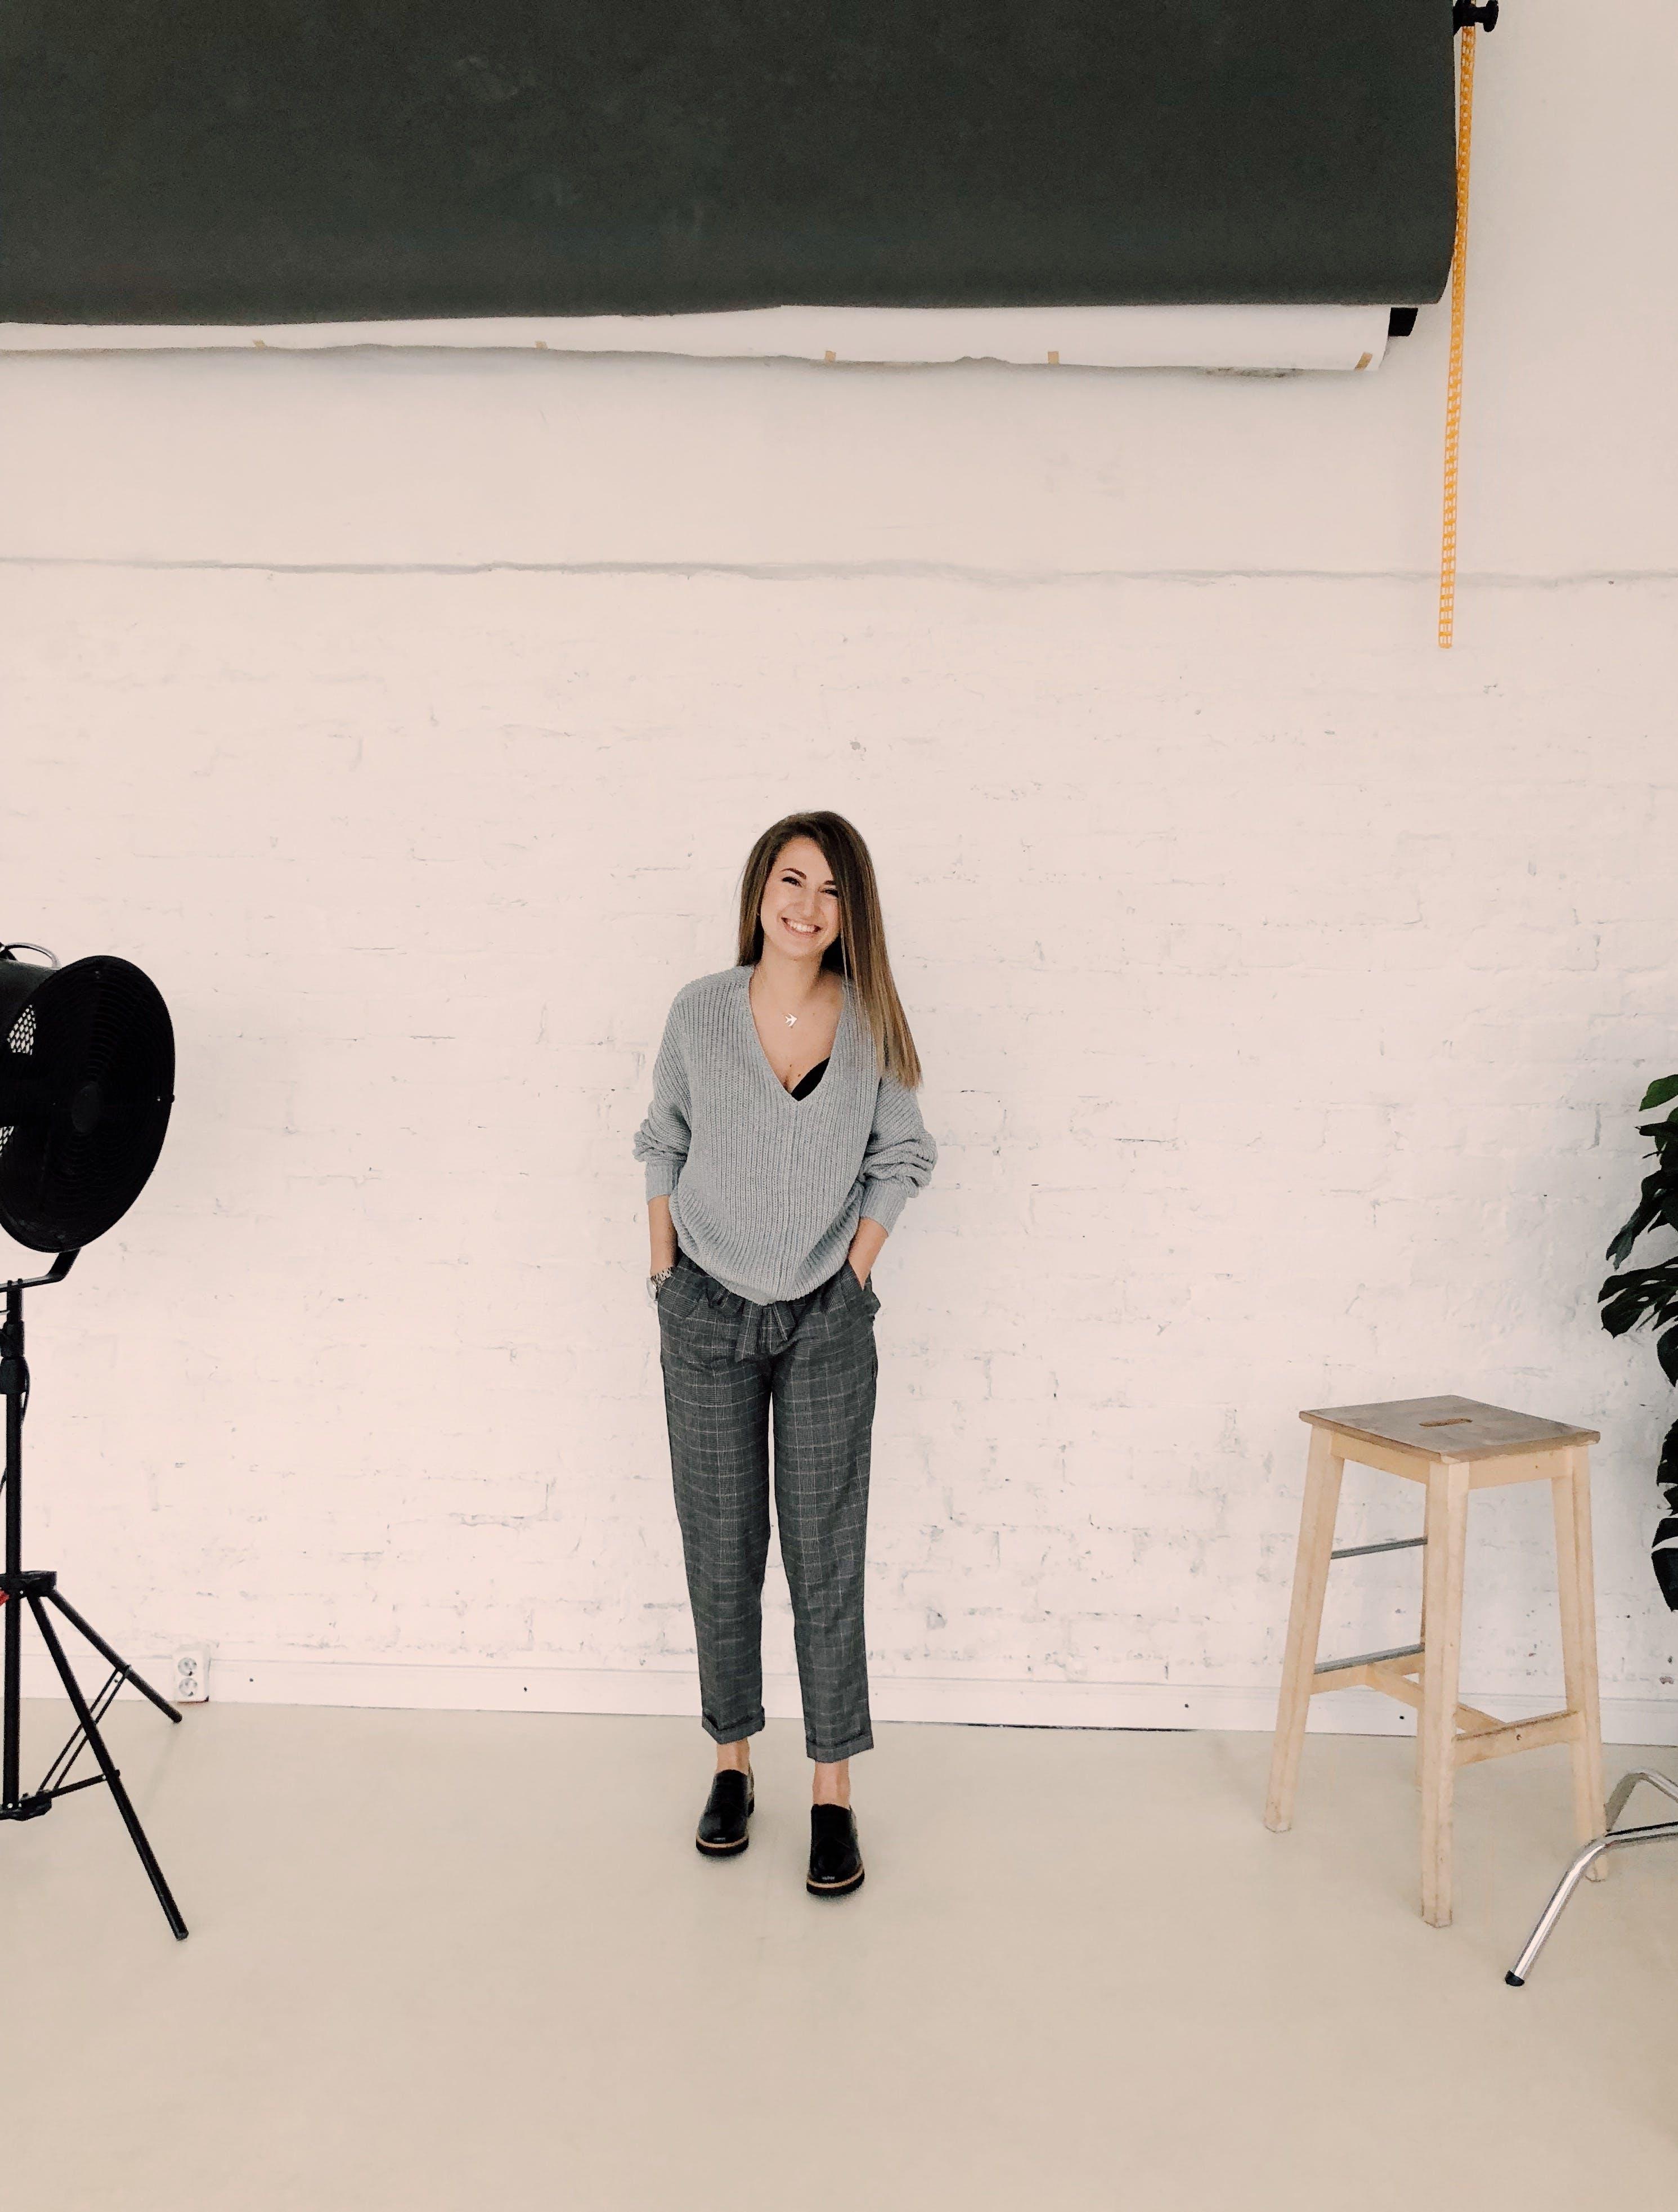 Photo of Woman Wearing Gray Sweater